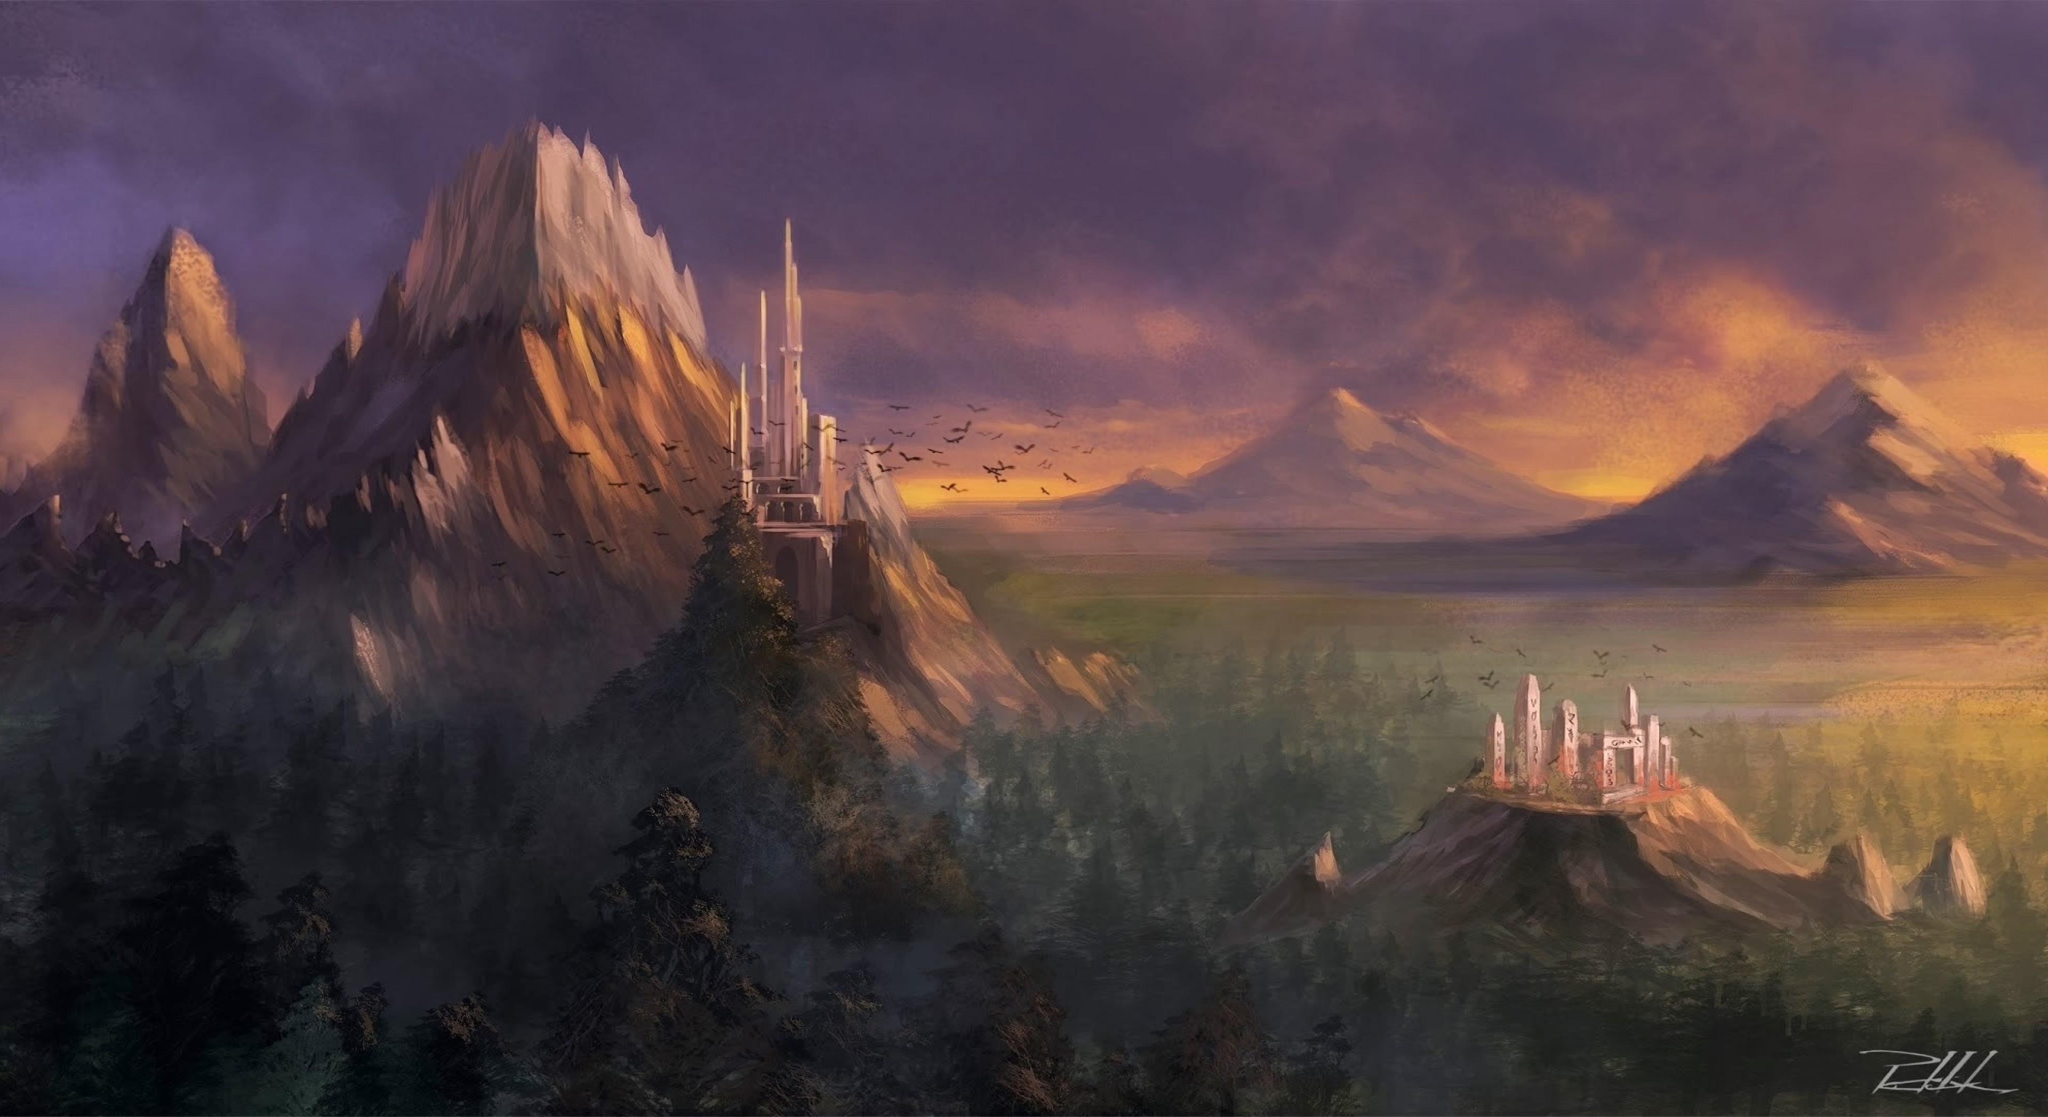 Fall Pixel Art Iphone Wallpaper Download 3840x2160 Fantasy Landscape Castle Mountain